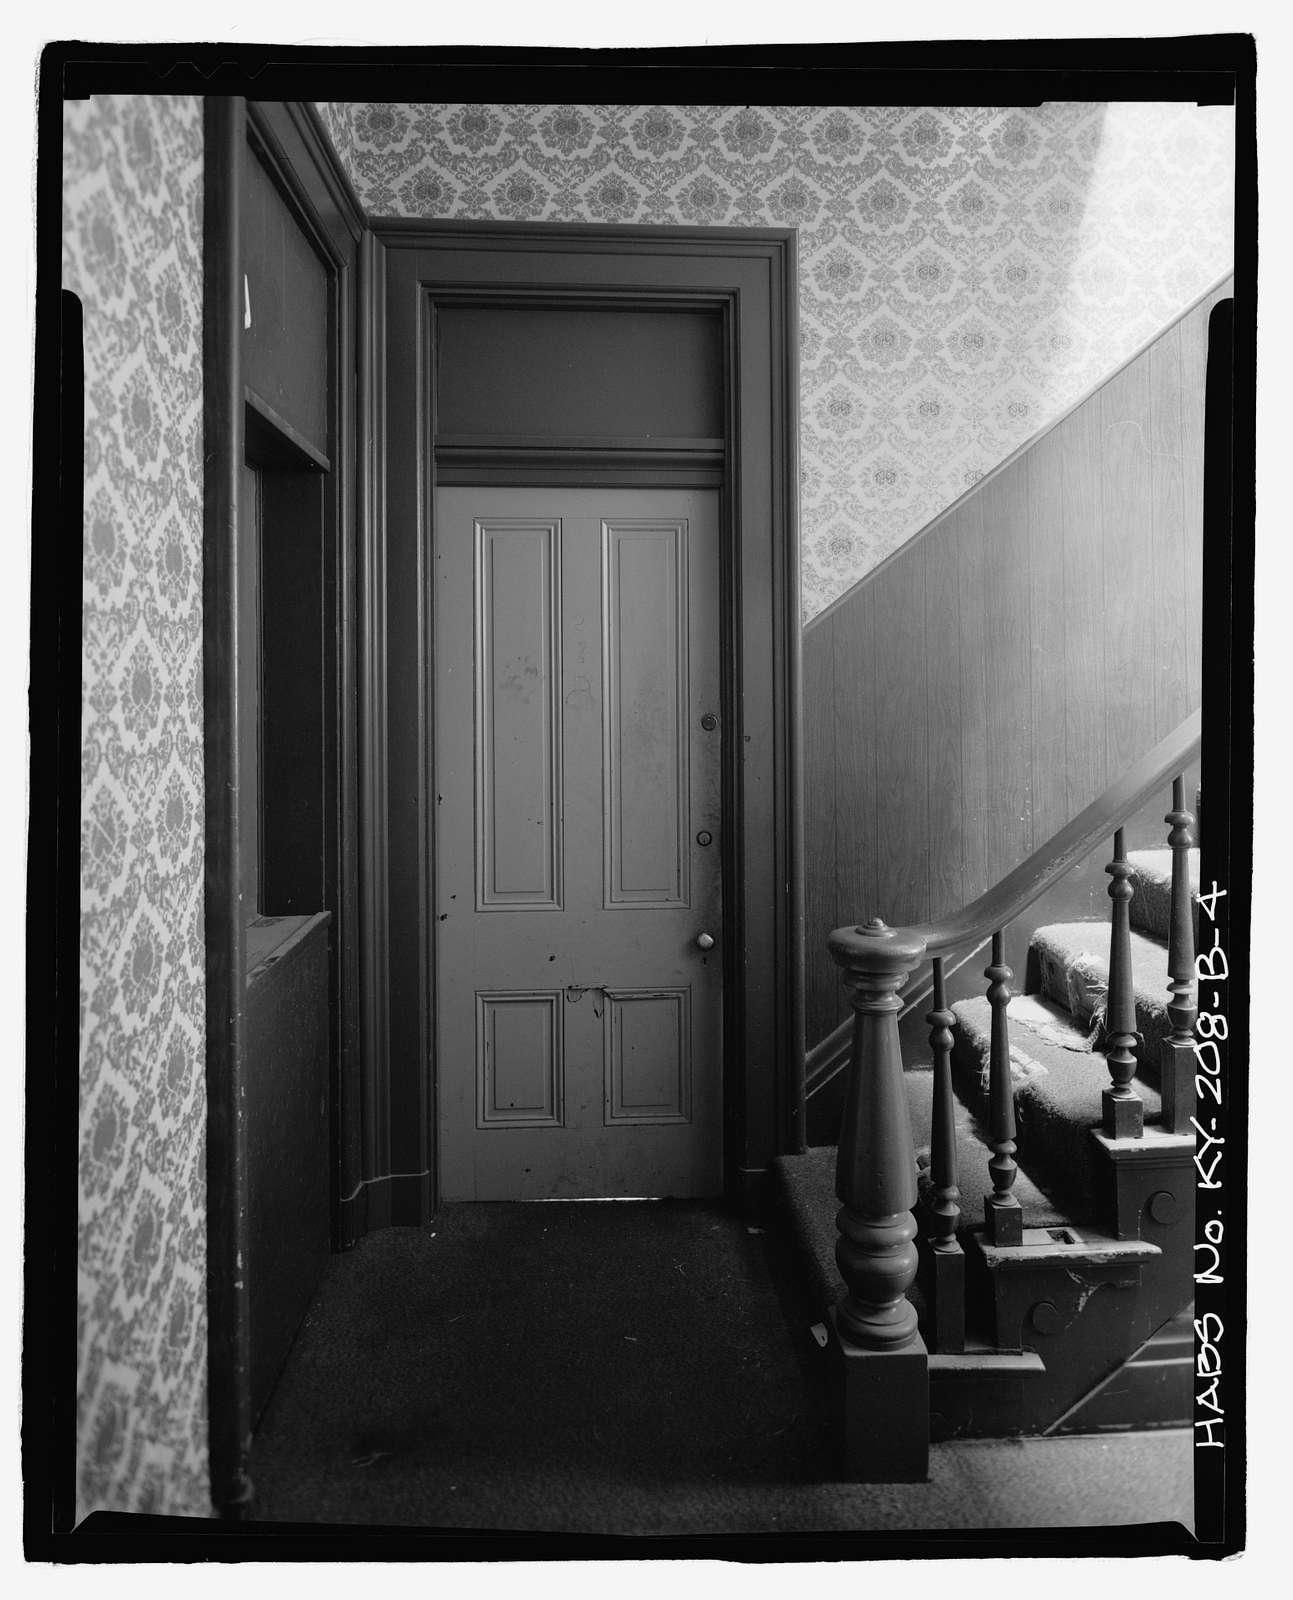 Boro Brothers Building, Confectionary & Saloon, 118-120 East Second Street, Covington, Kenton County, KY